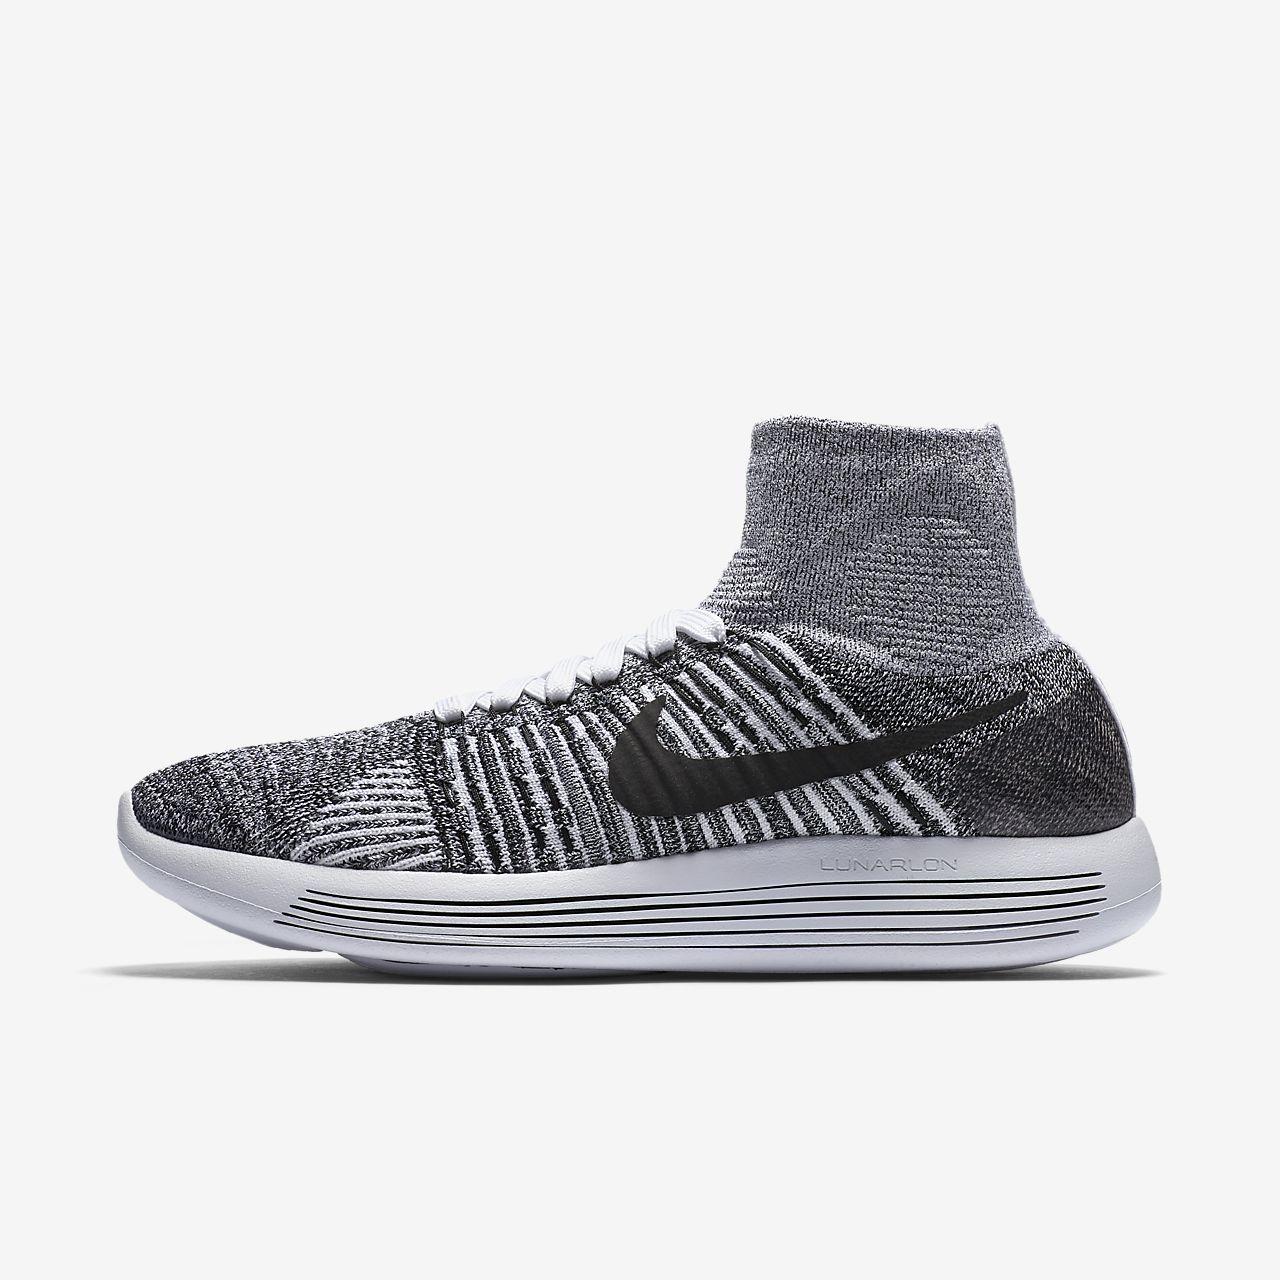 Nike Donna lunarepic Flyknit 818677 101 UK 6 EURO 40